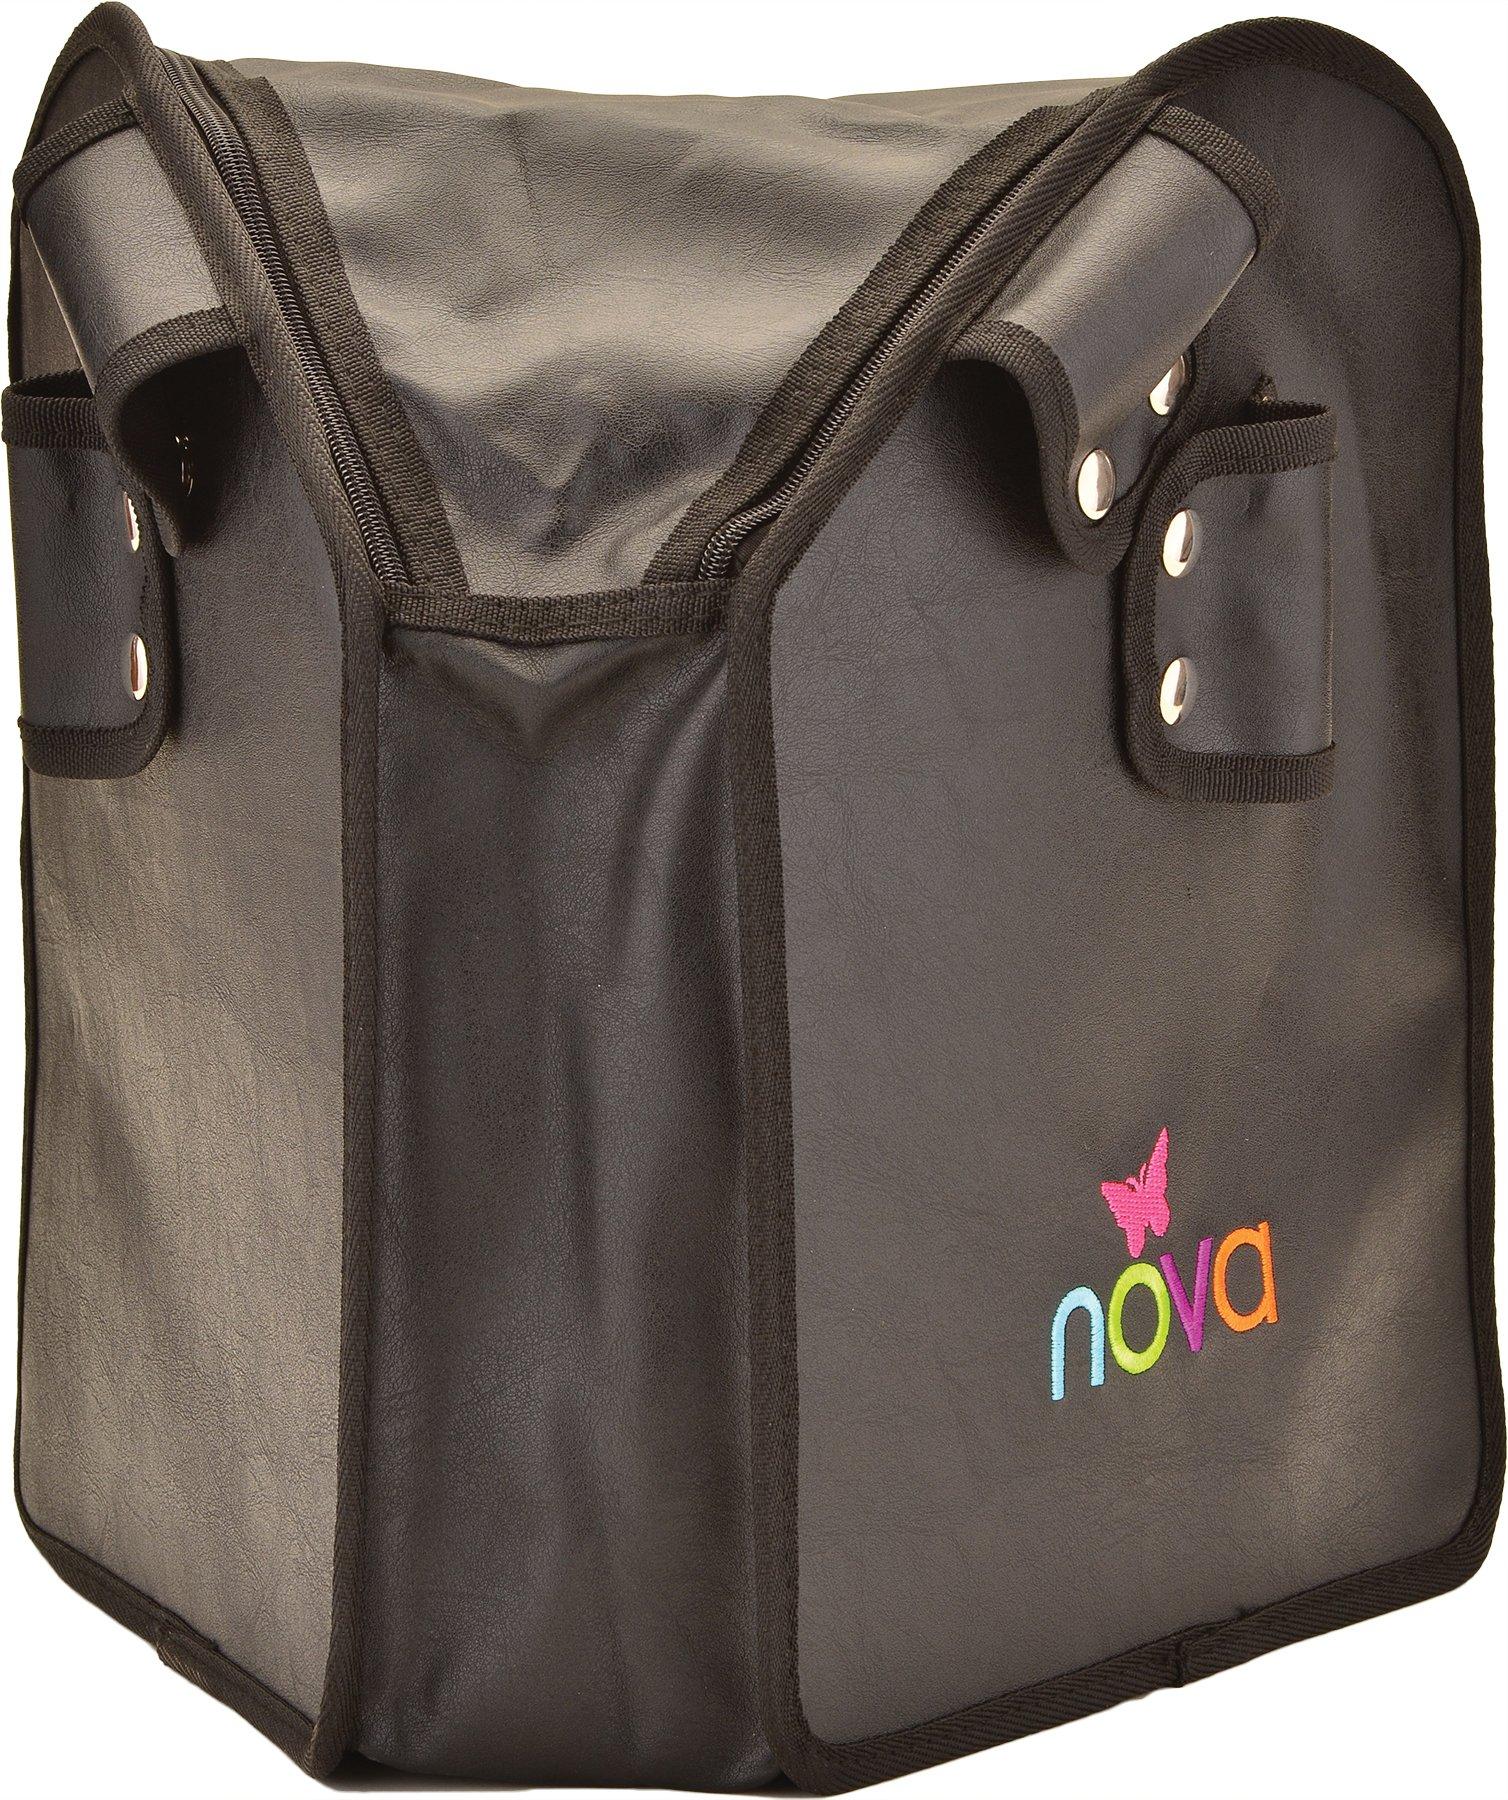 NOVA Pouch Bag for Nova 3 Wheeled Rollator Walker, Replacement Bag for Traveler 4900 by NOVA Medical Products